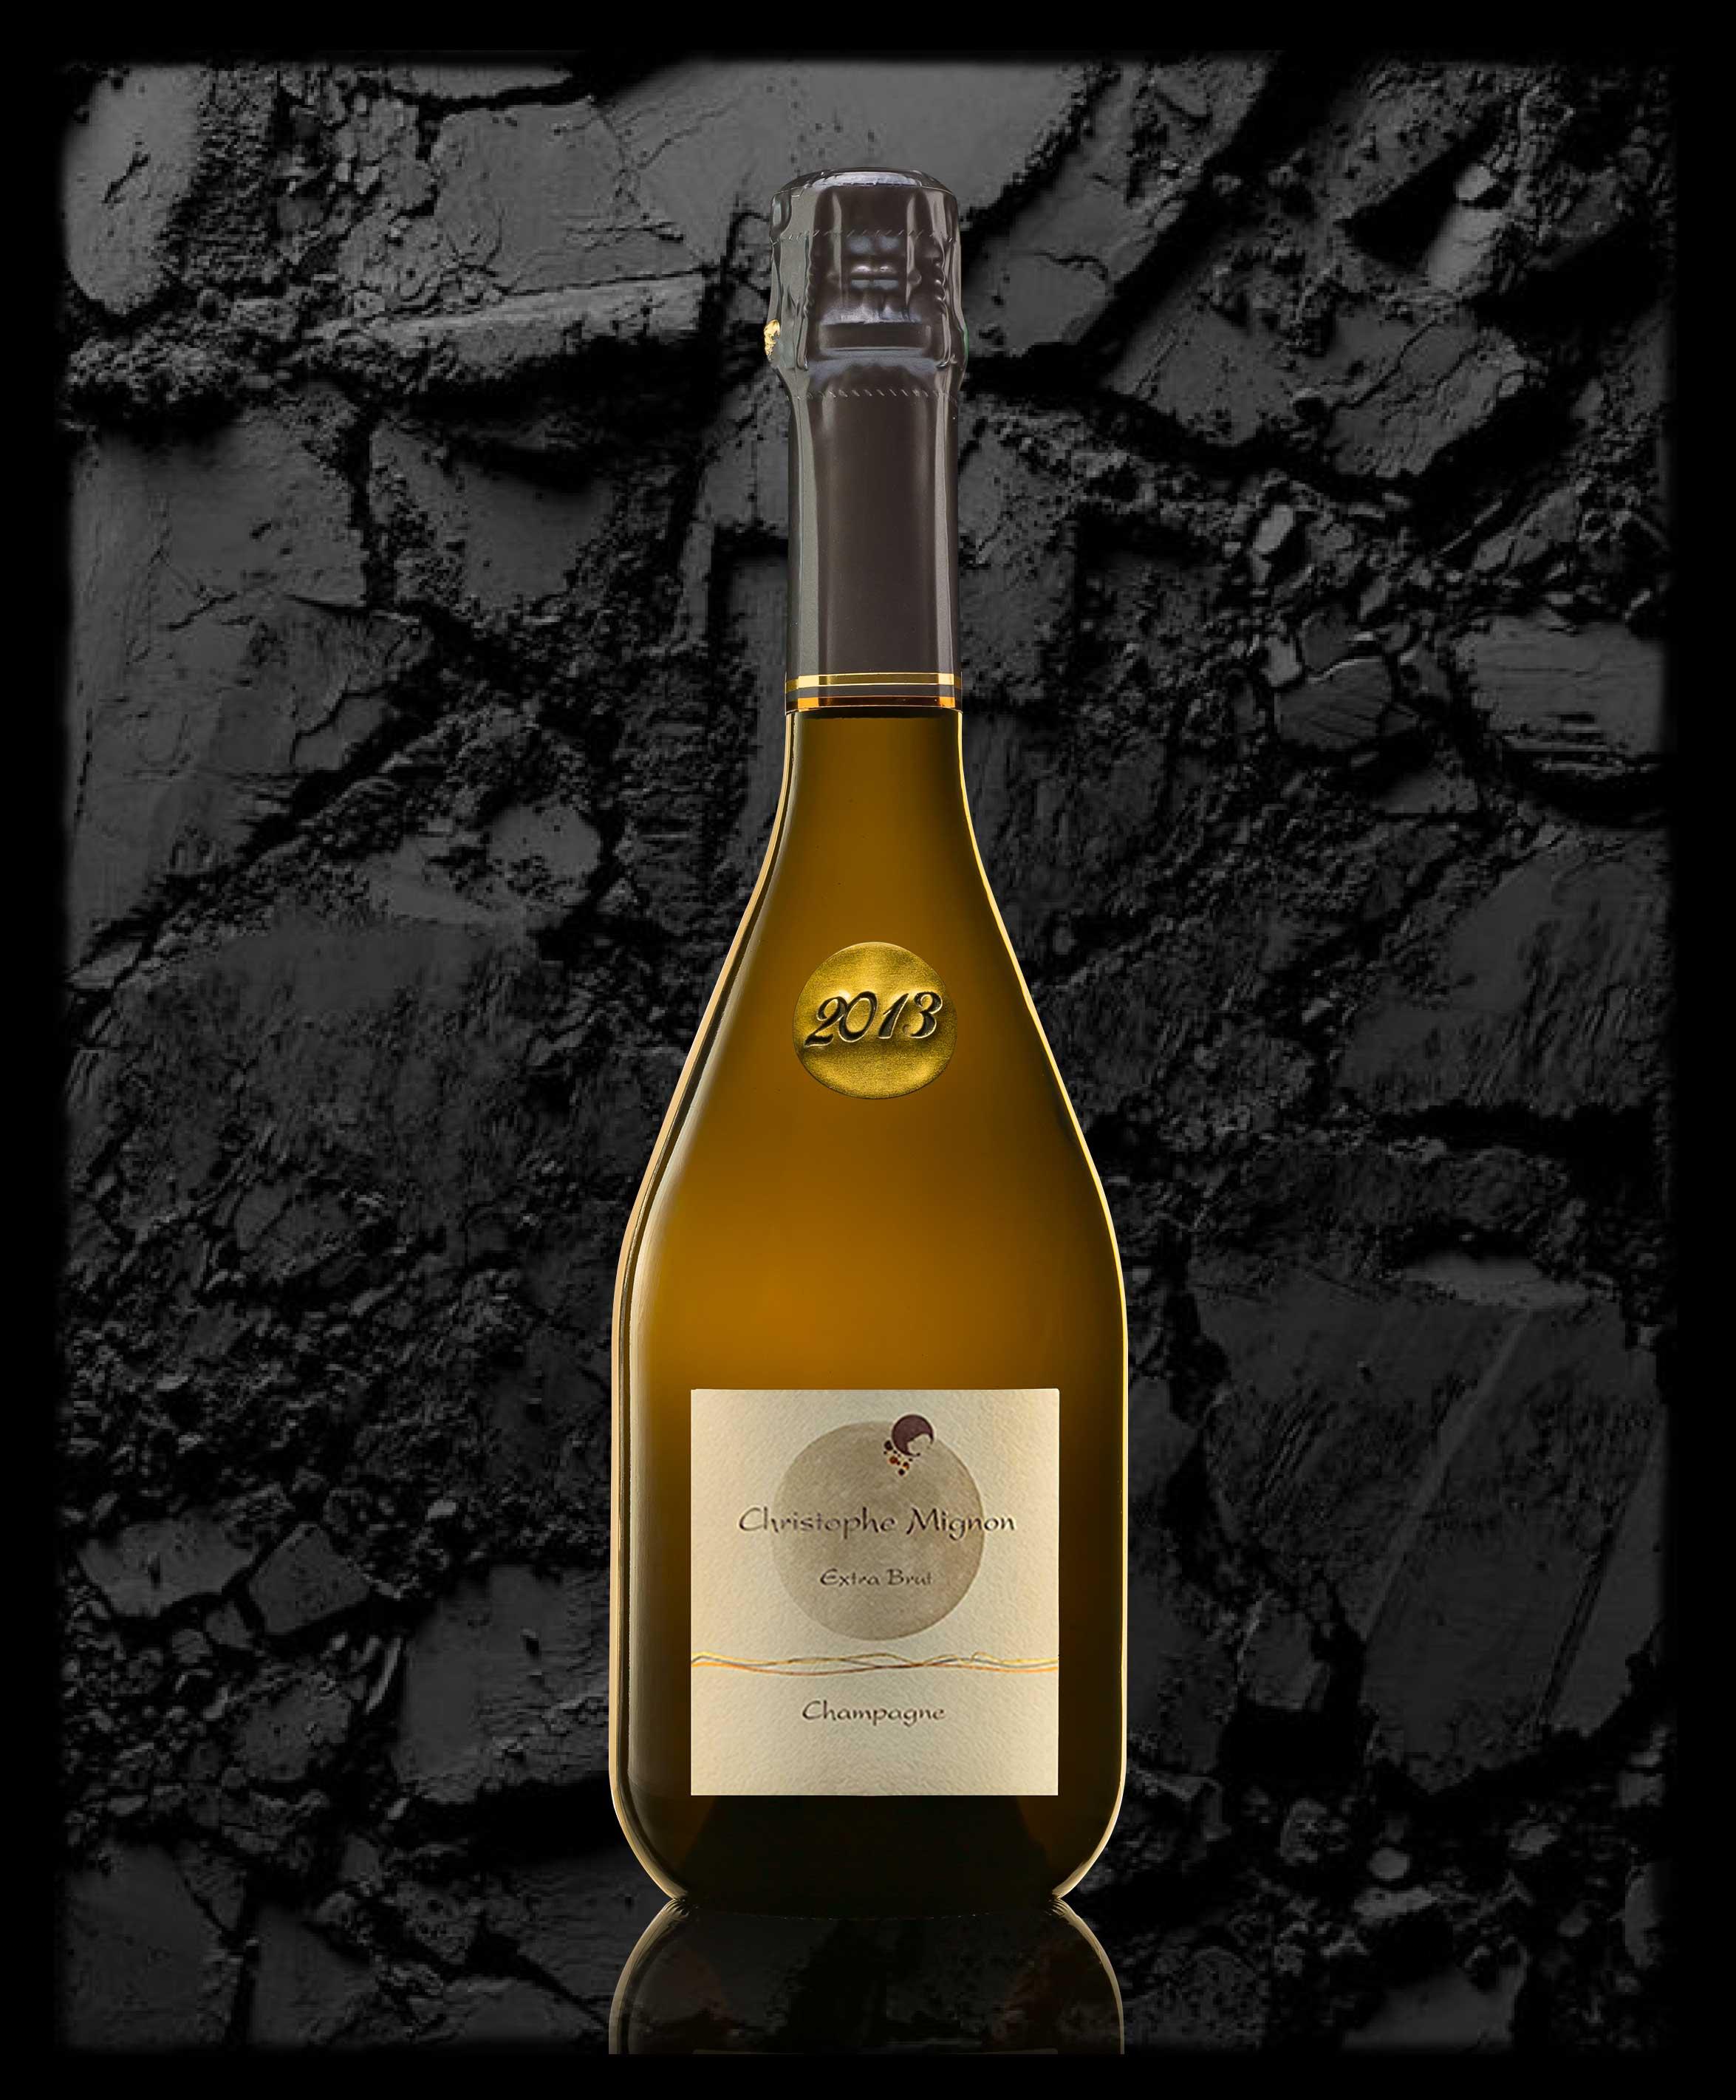 Pur Meunier Millesime Extra Brut Champagne Christophe Mignon